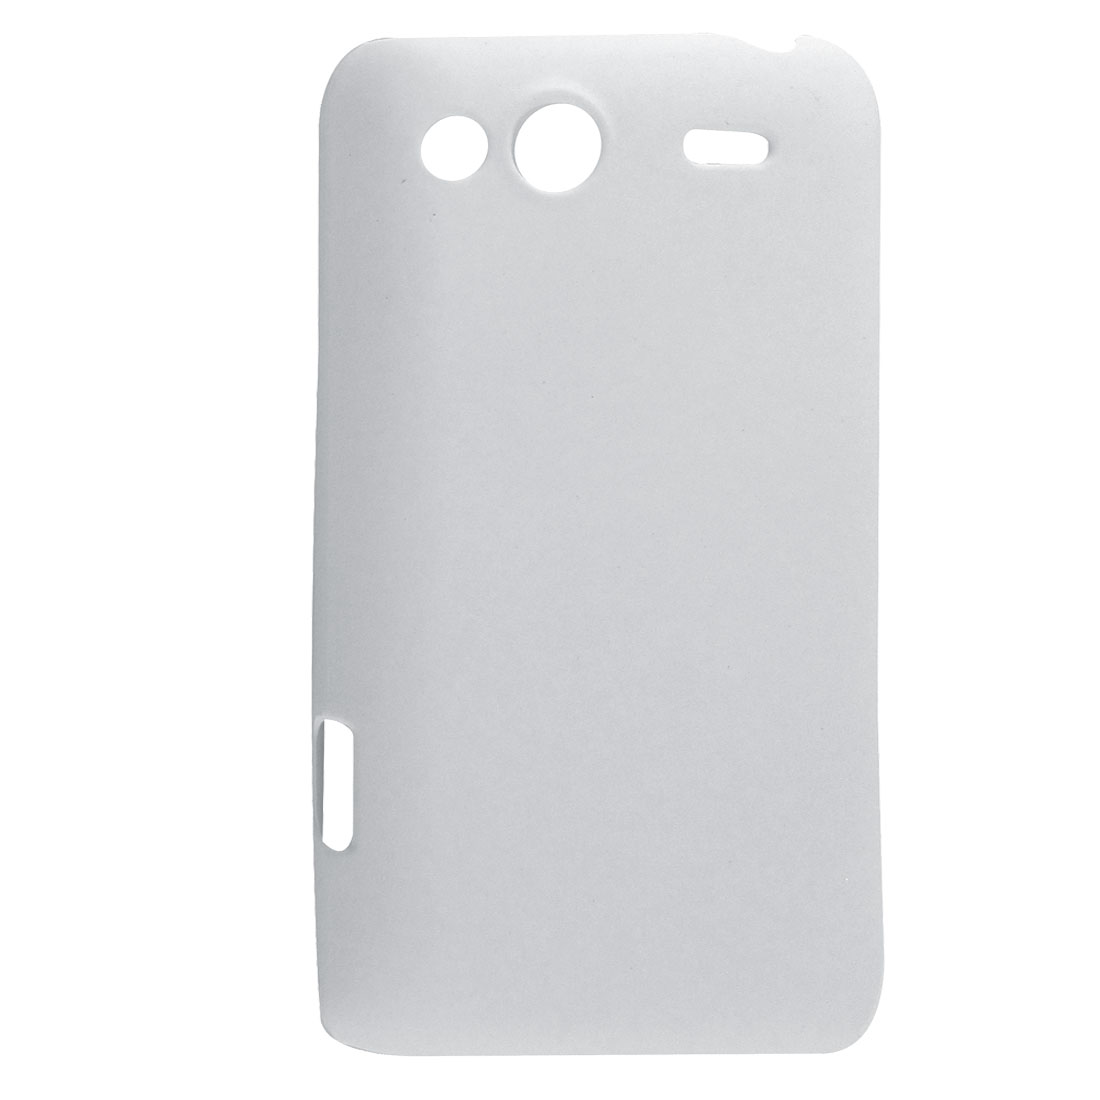 Rubberized Plastic Back Shell White for HTC Salsa G15